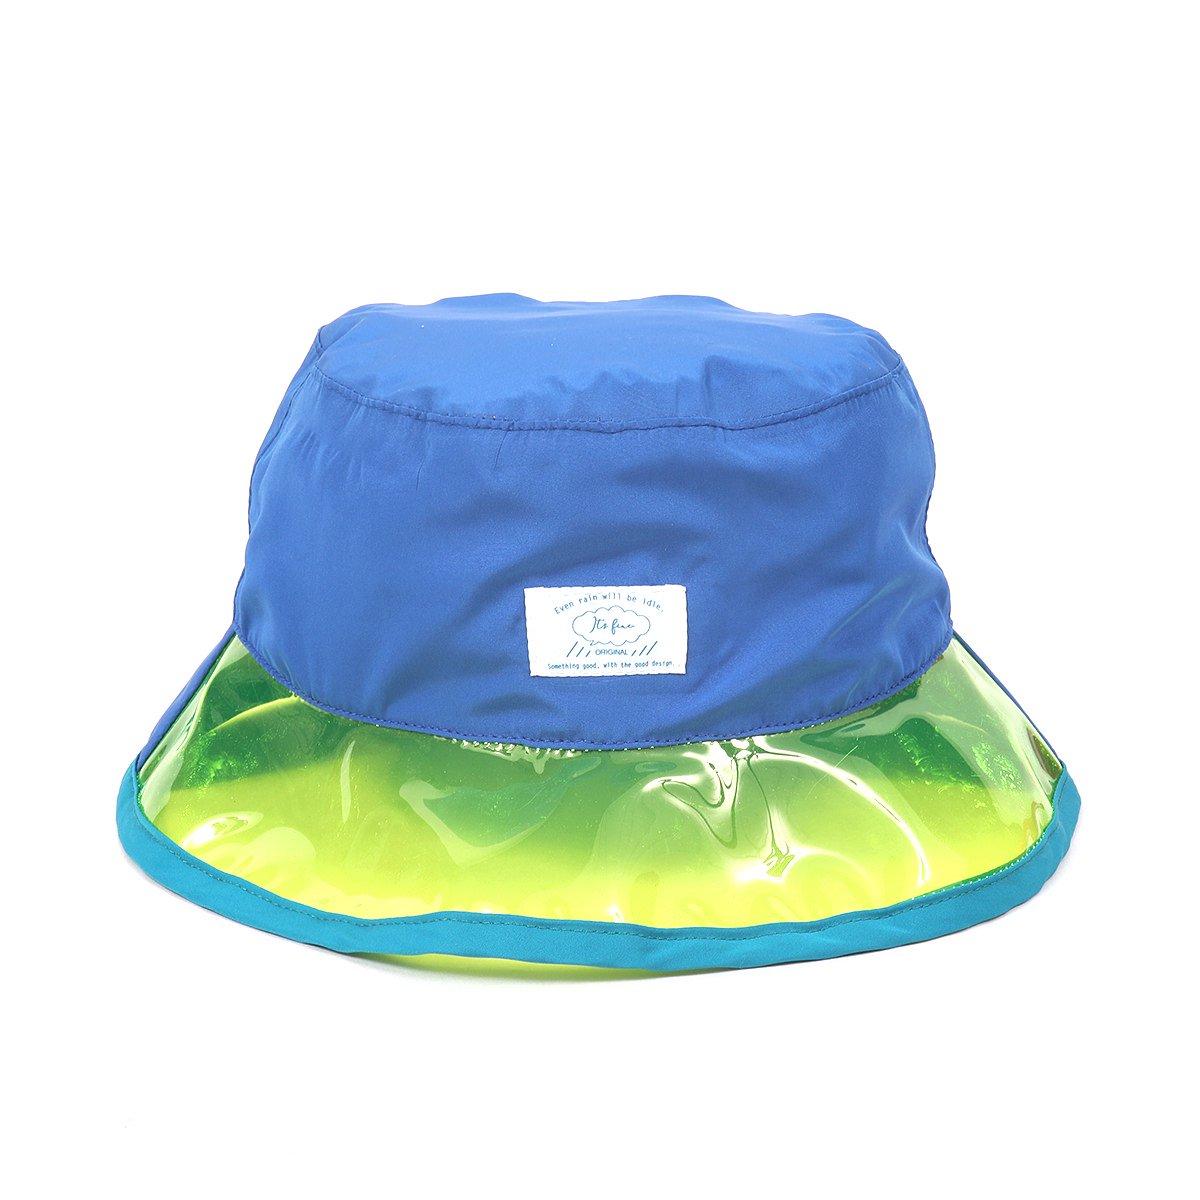 【BABY】Baby Rain PVC Hat 詳細画像2